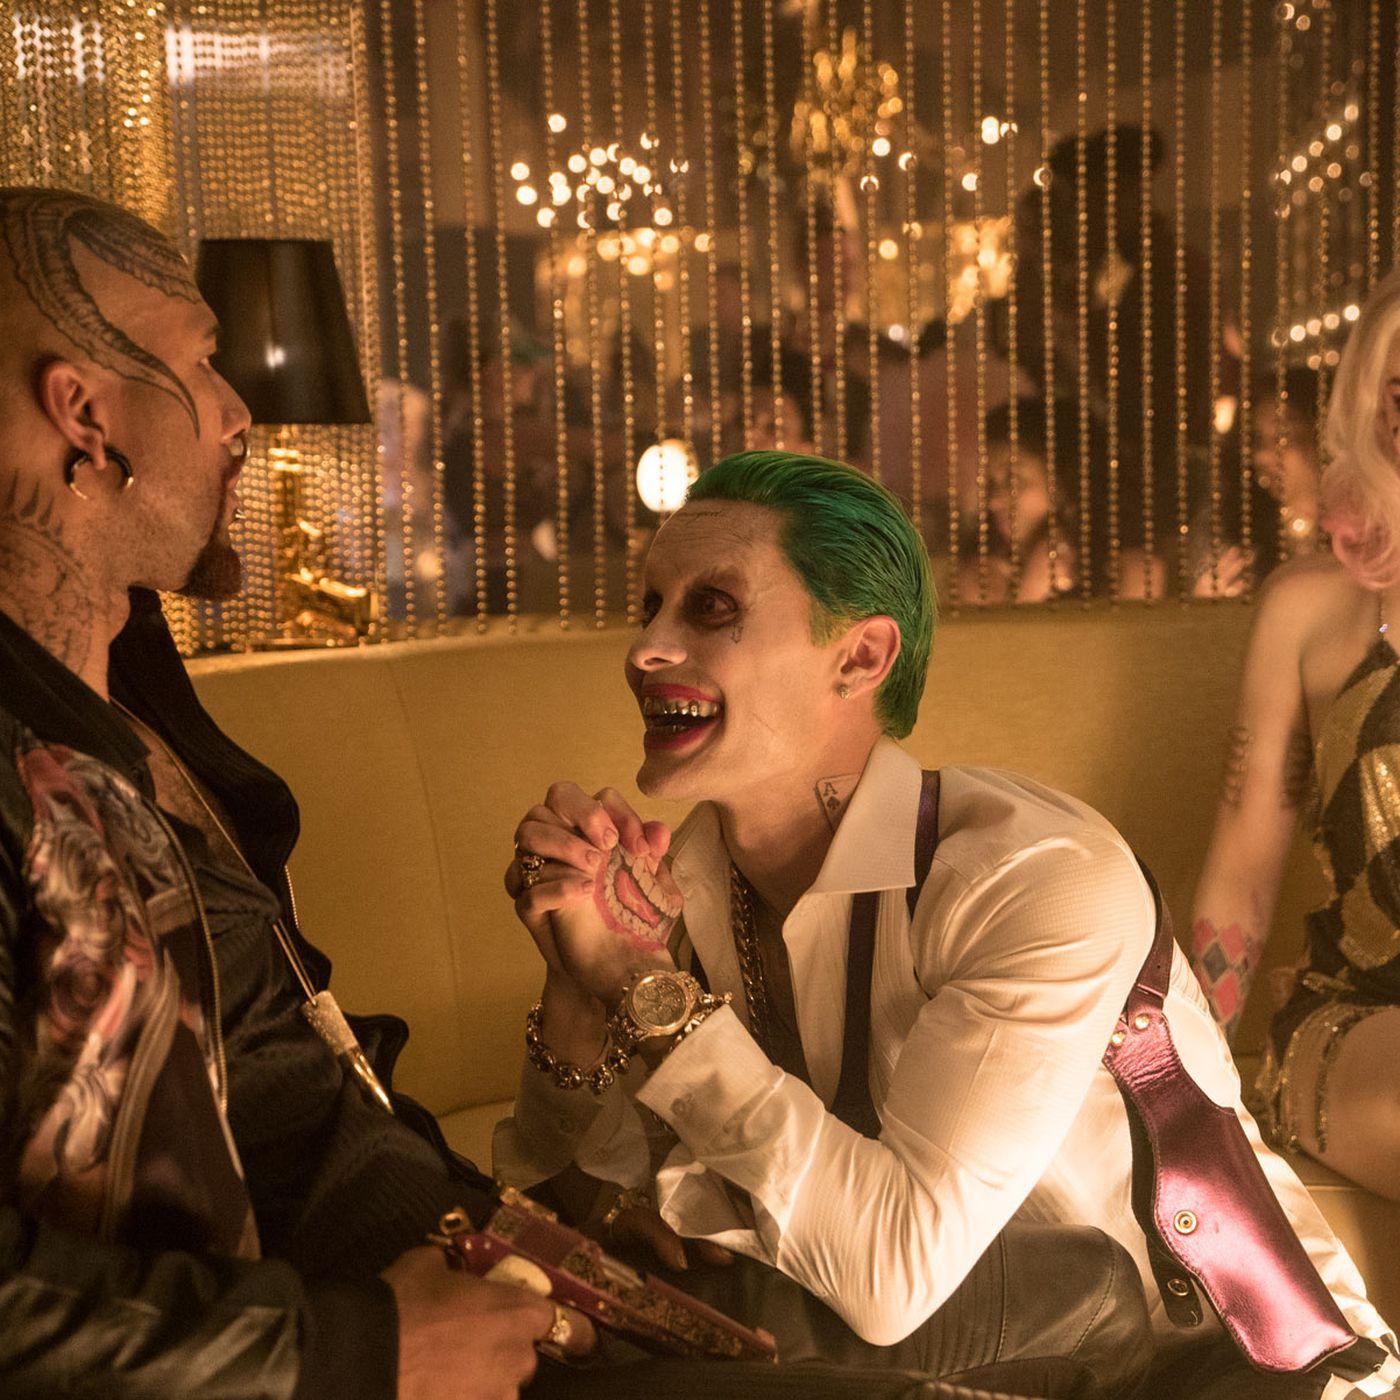 Suicide Squad Director Acknowledges Joker Should Have Been